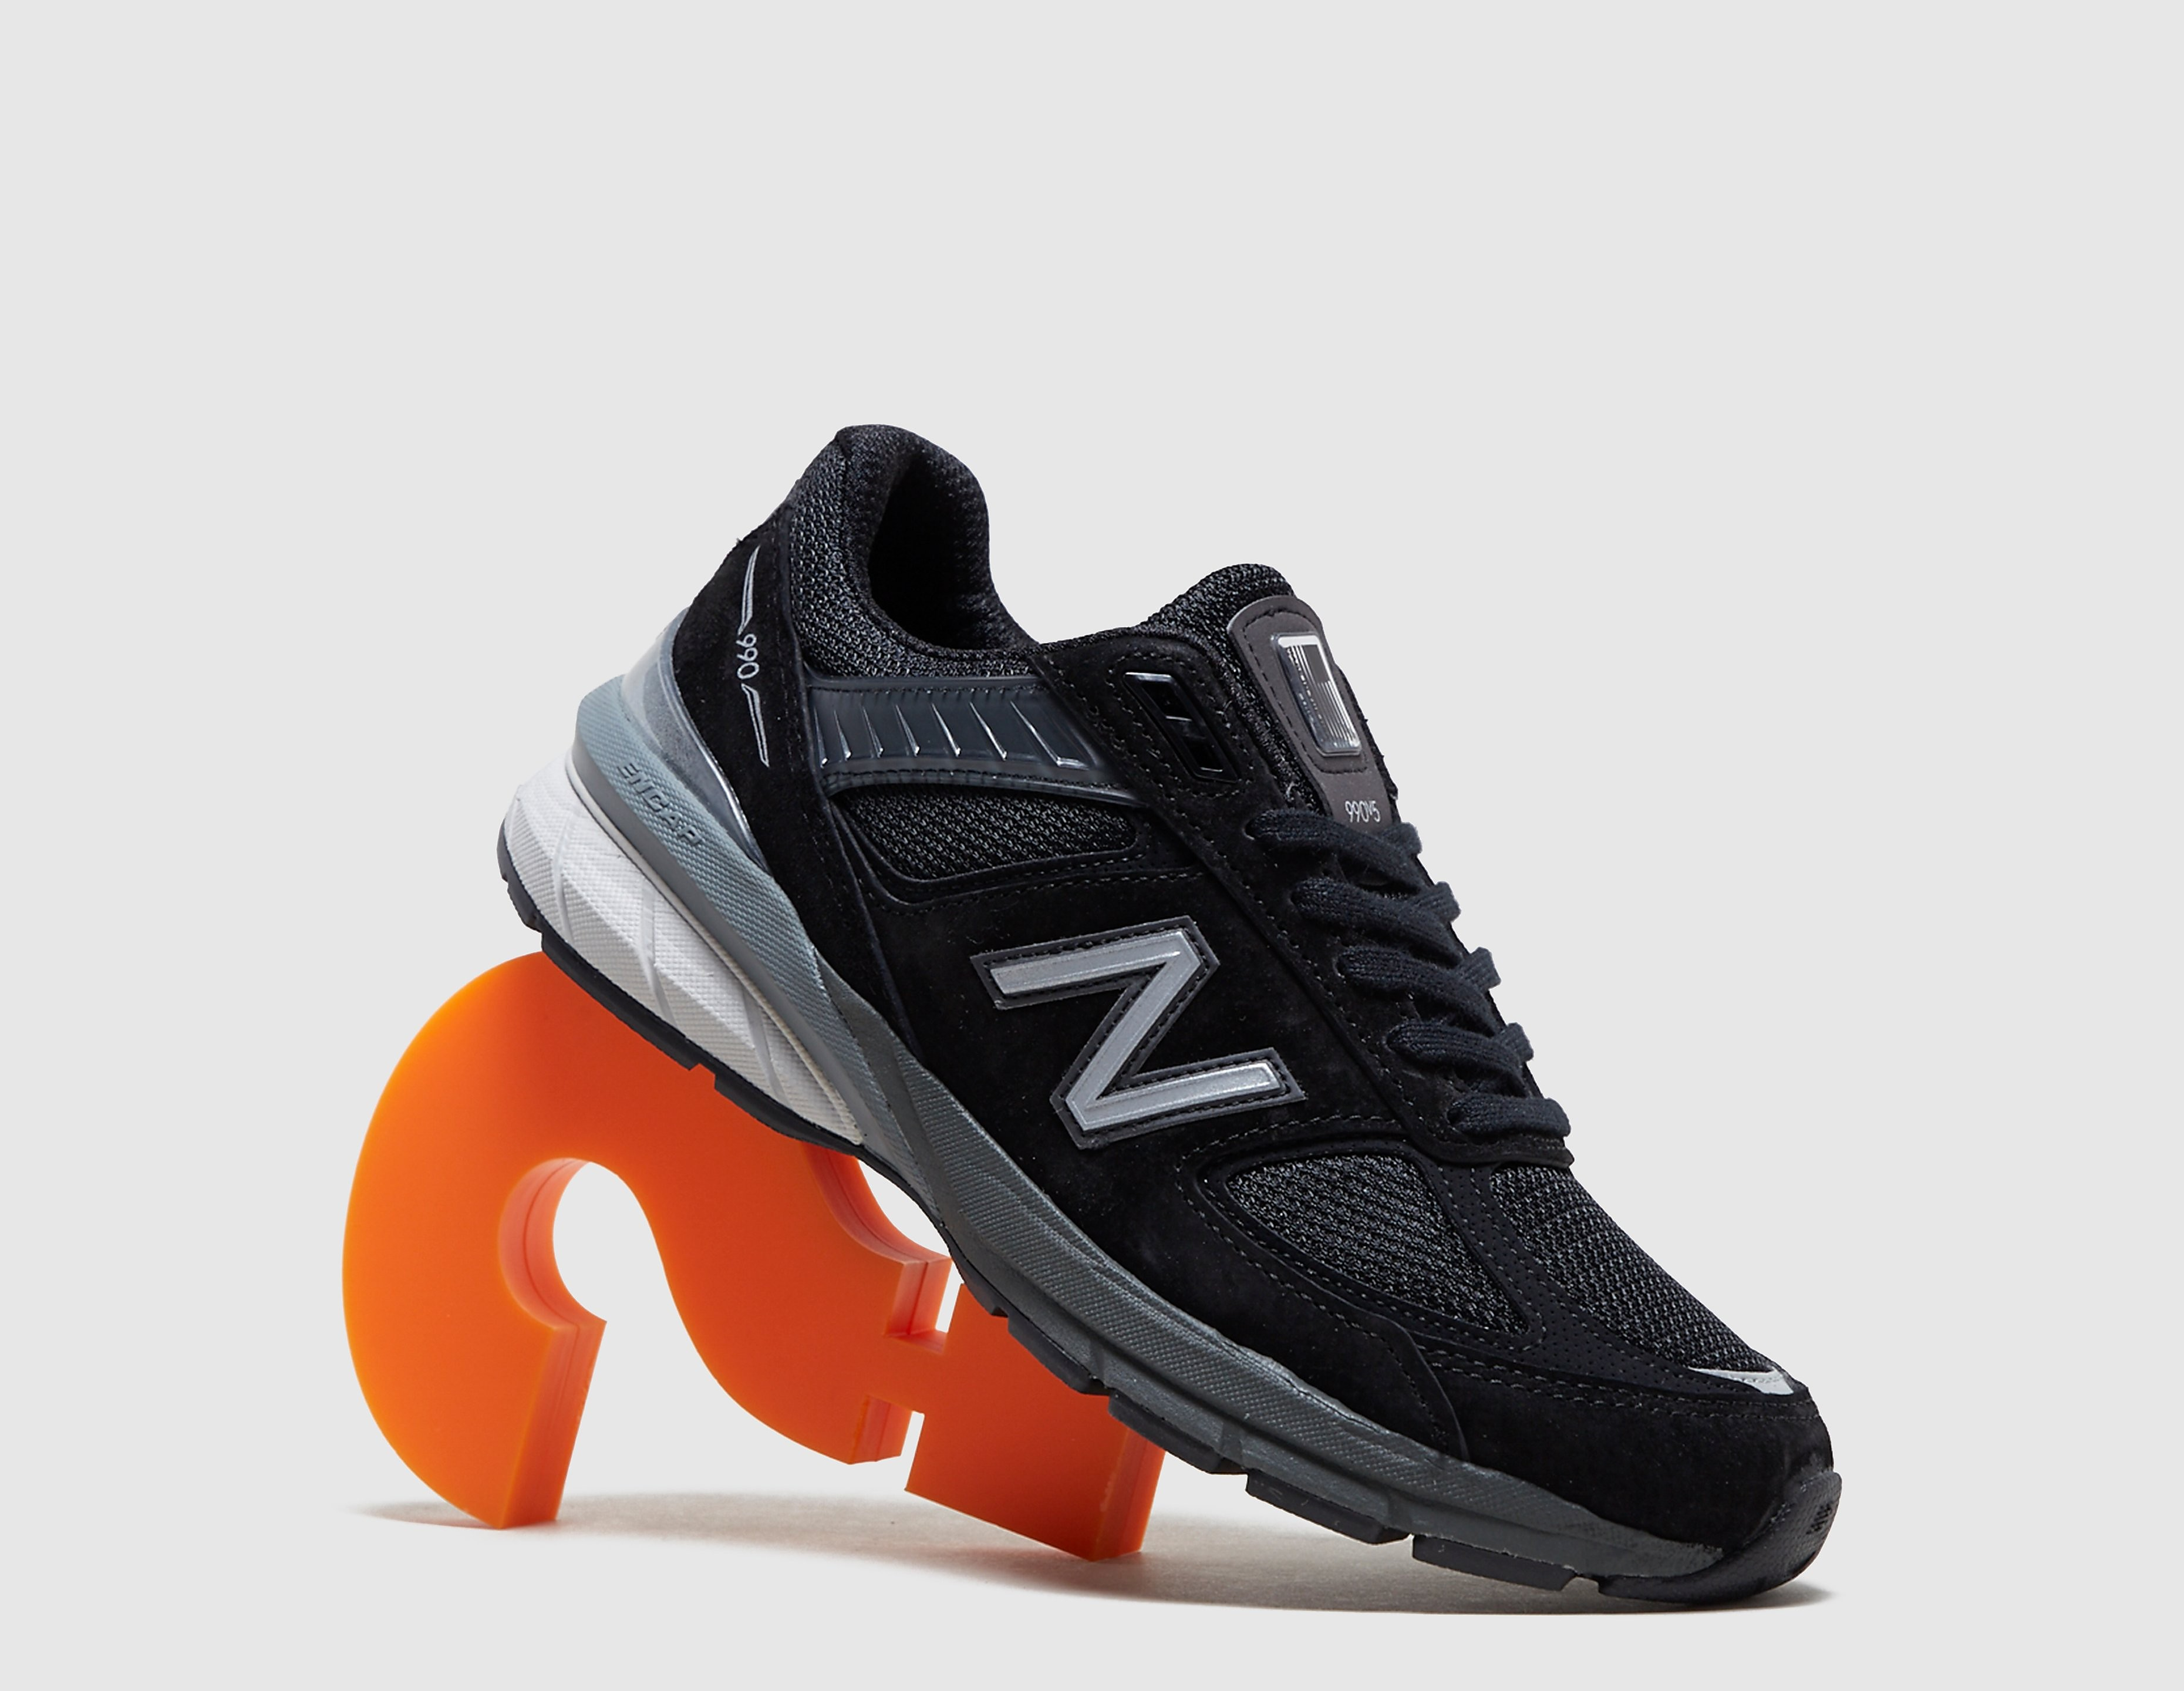 New Balance 990 Femme